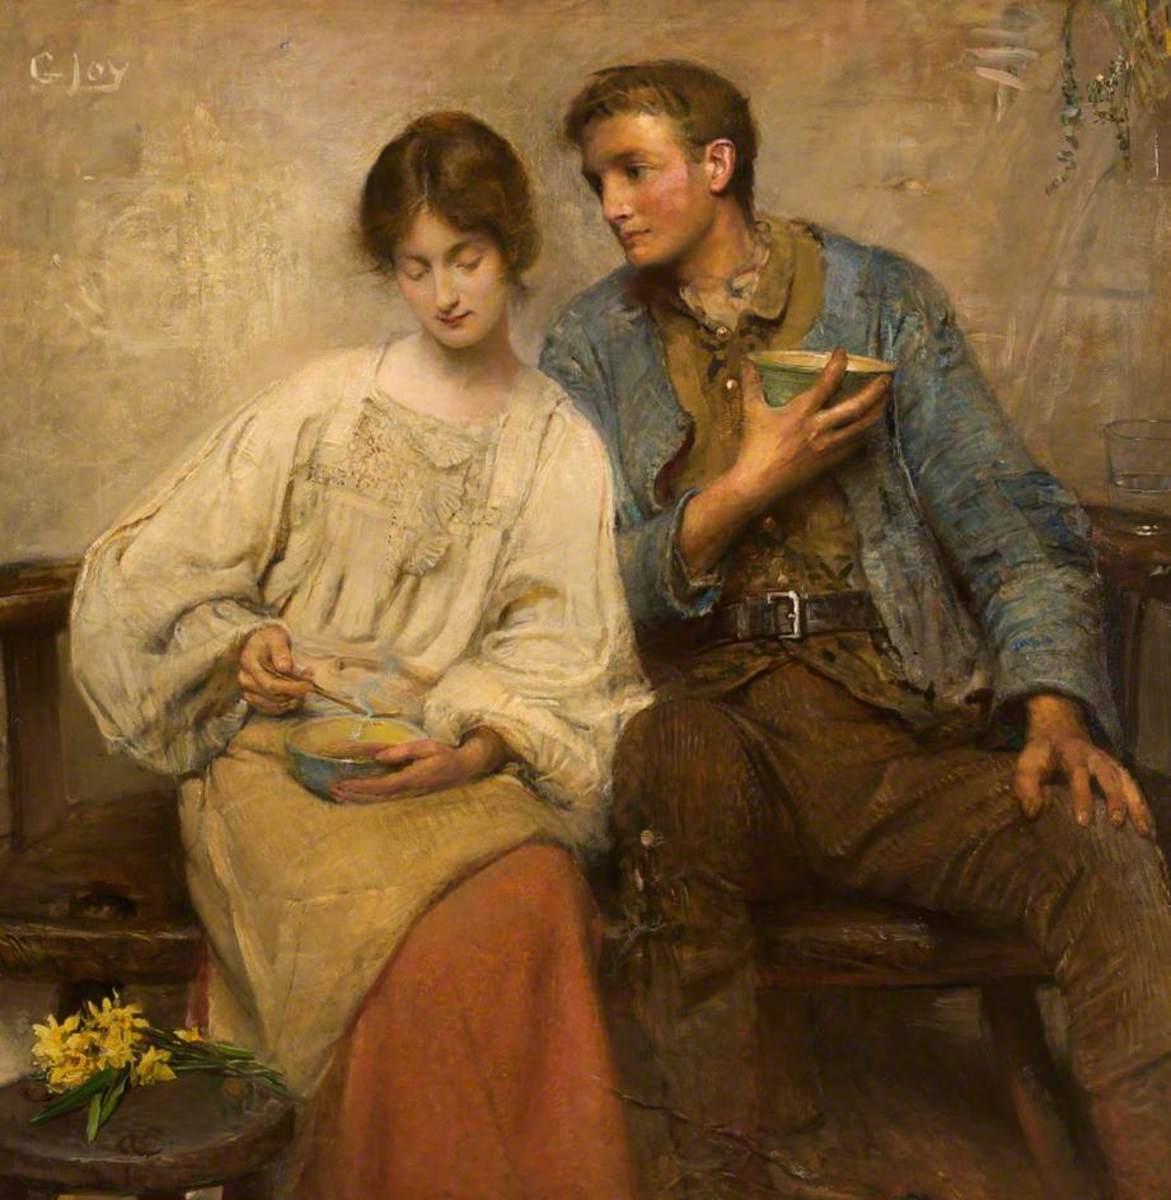 A Dinner of Herbs (Irish painter George William Joy 1844-1925)